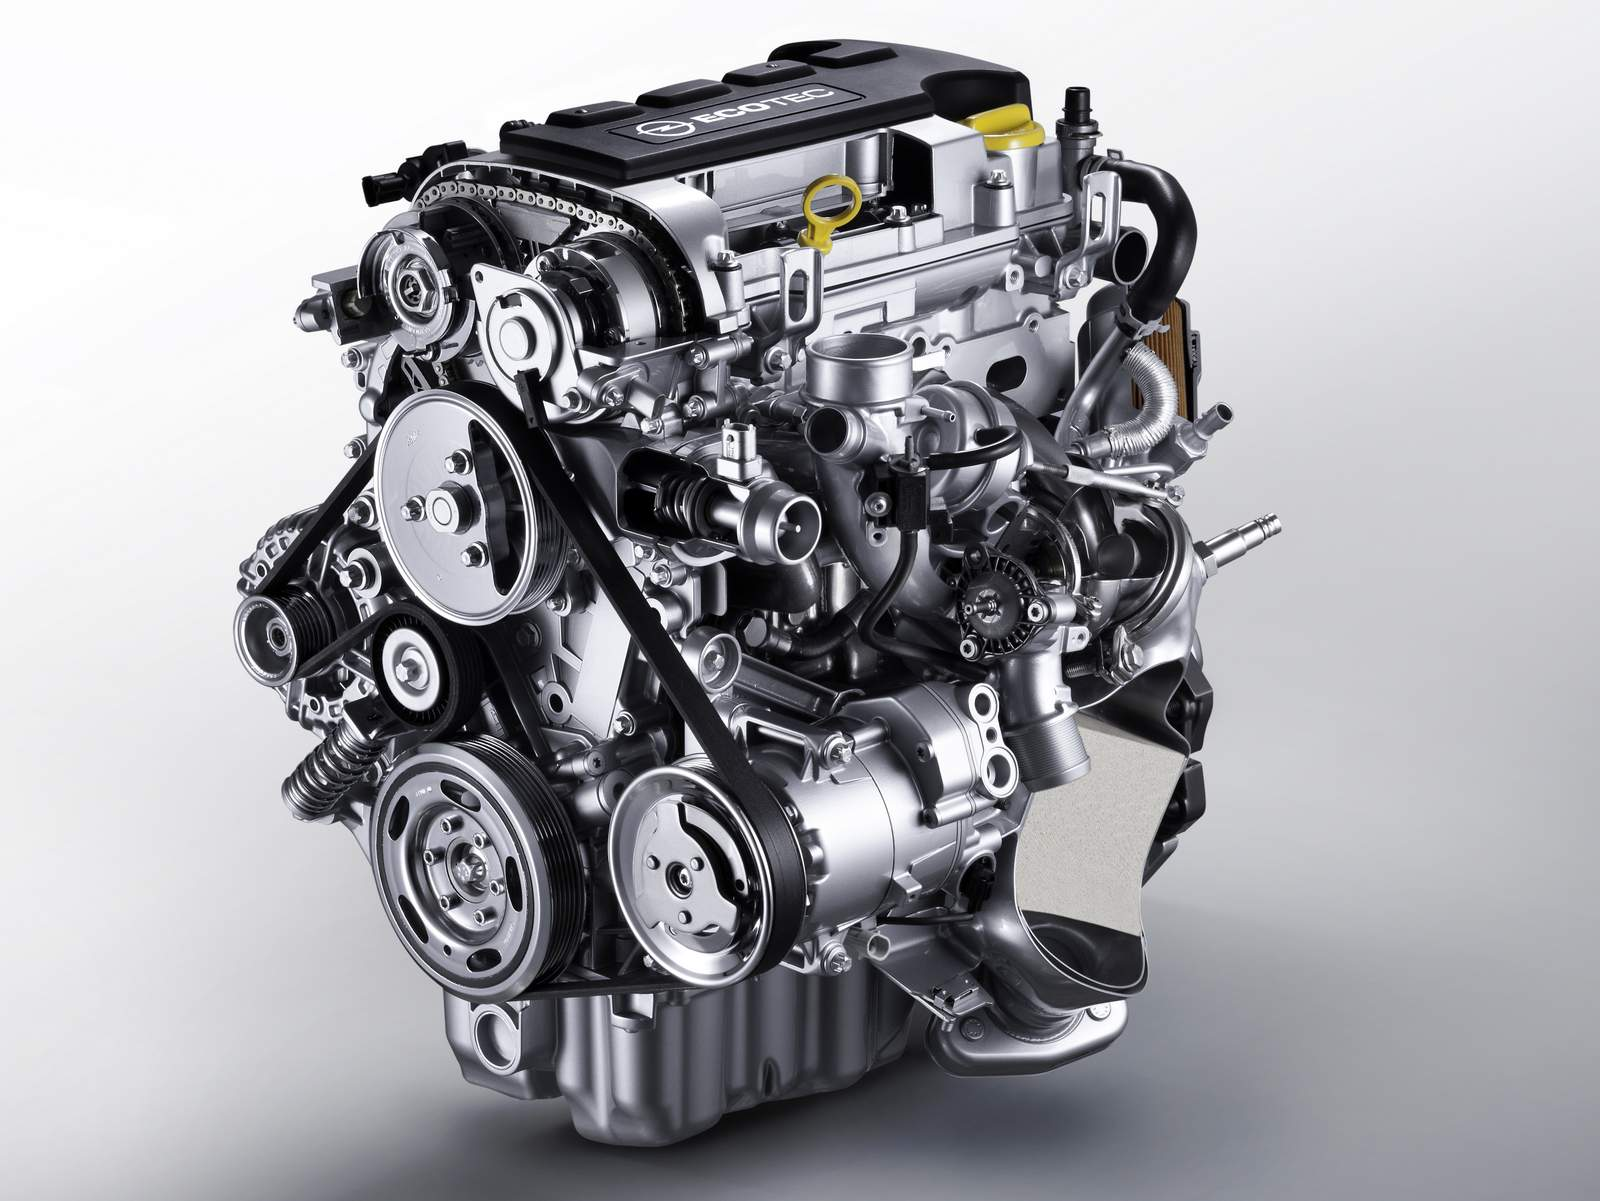 2016 Opel Corsa 1.4 Turbo